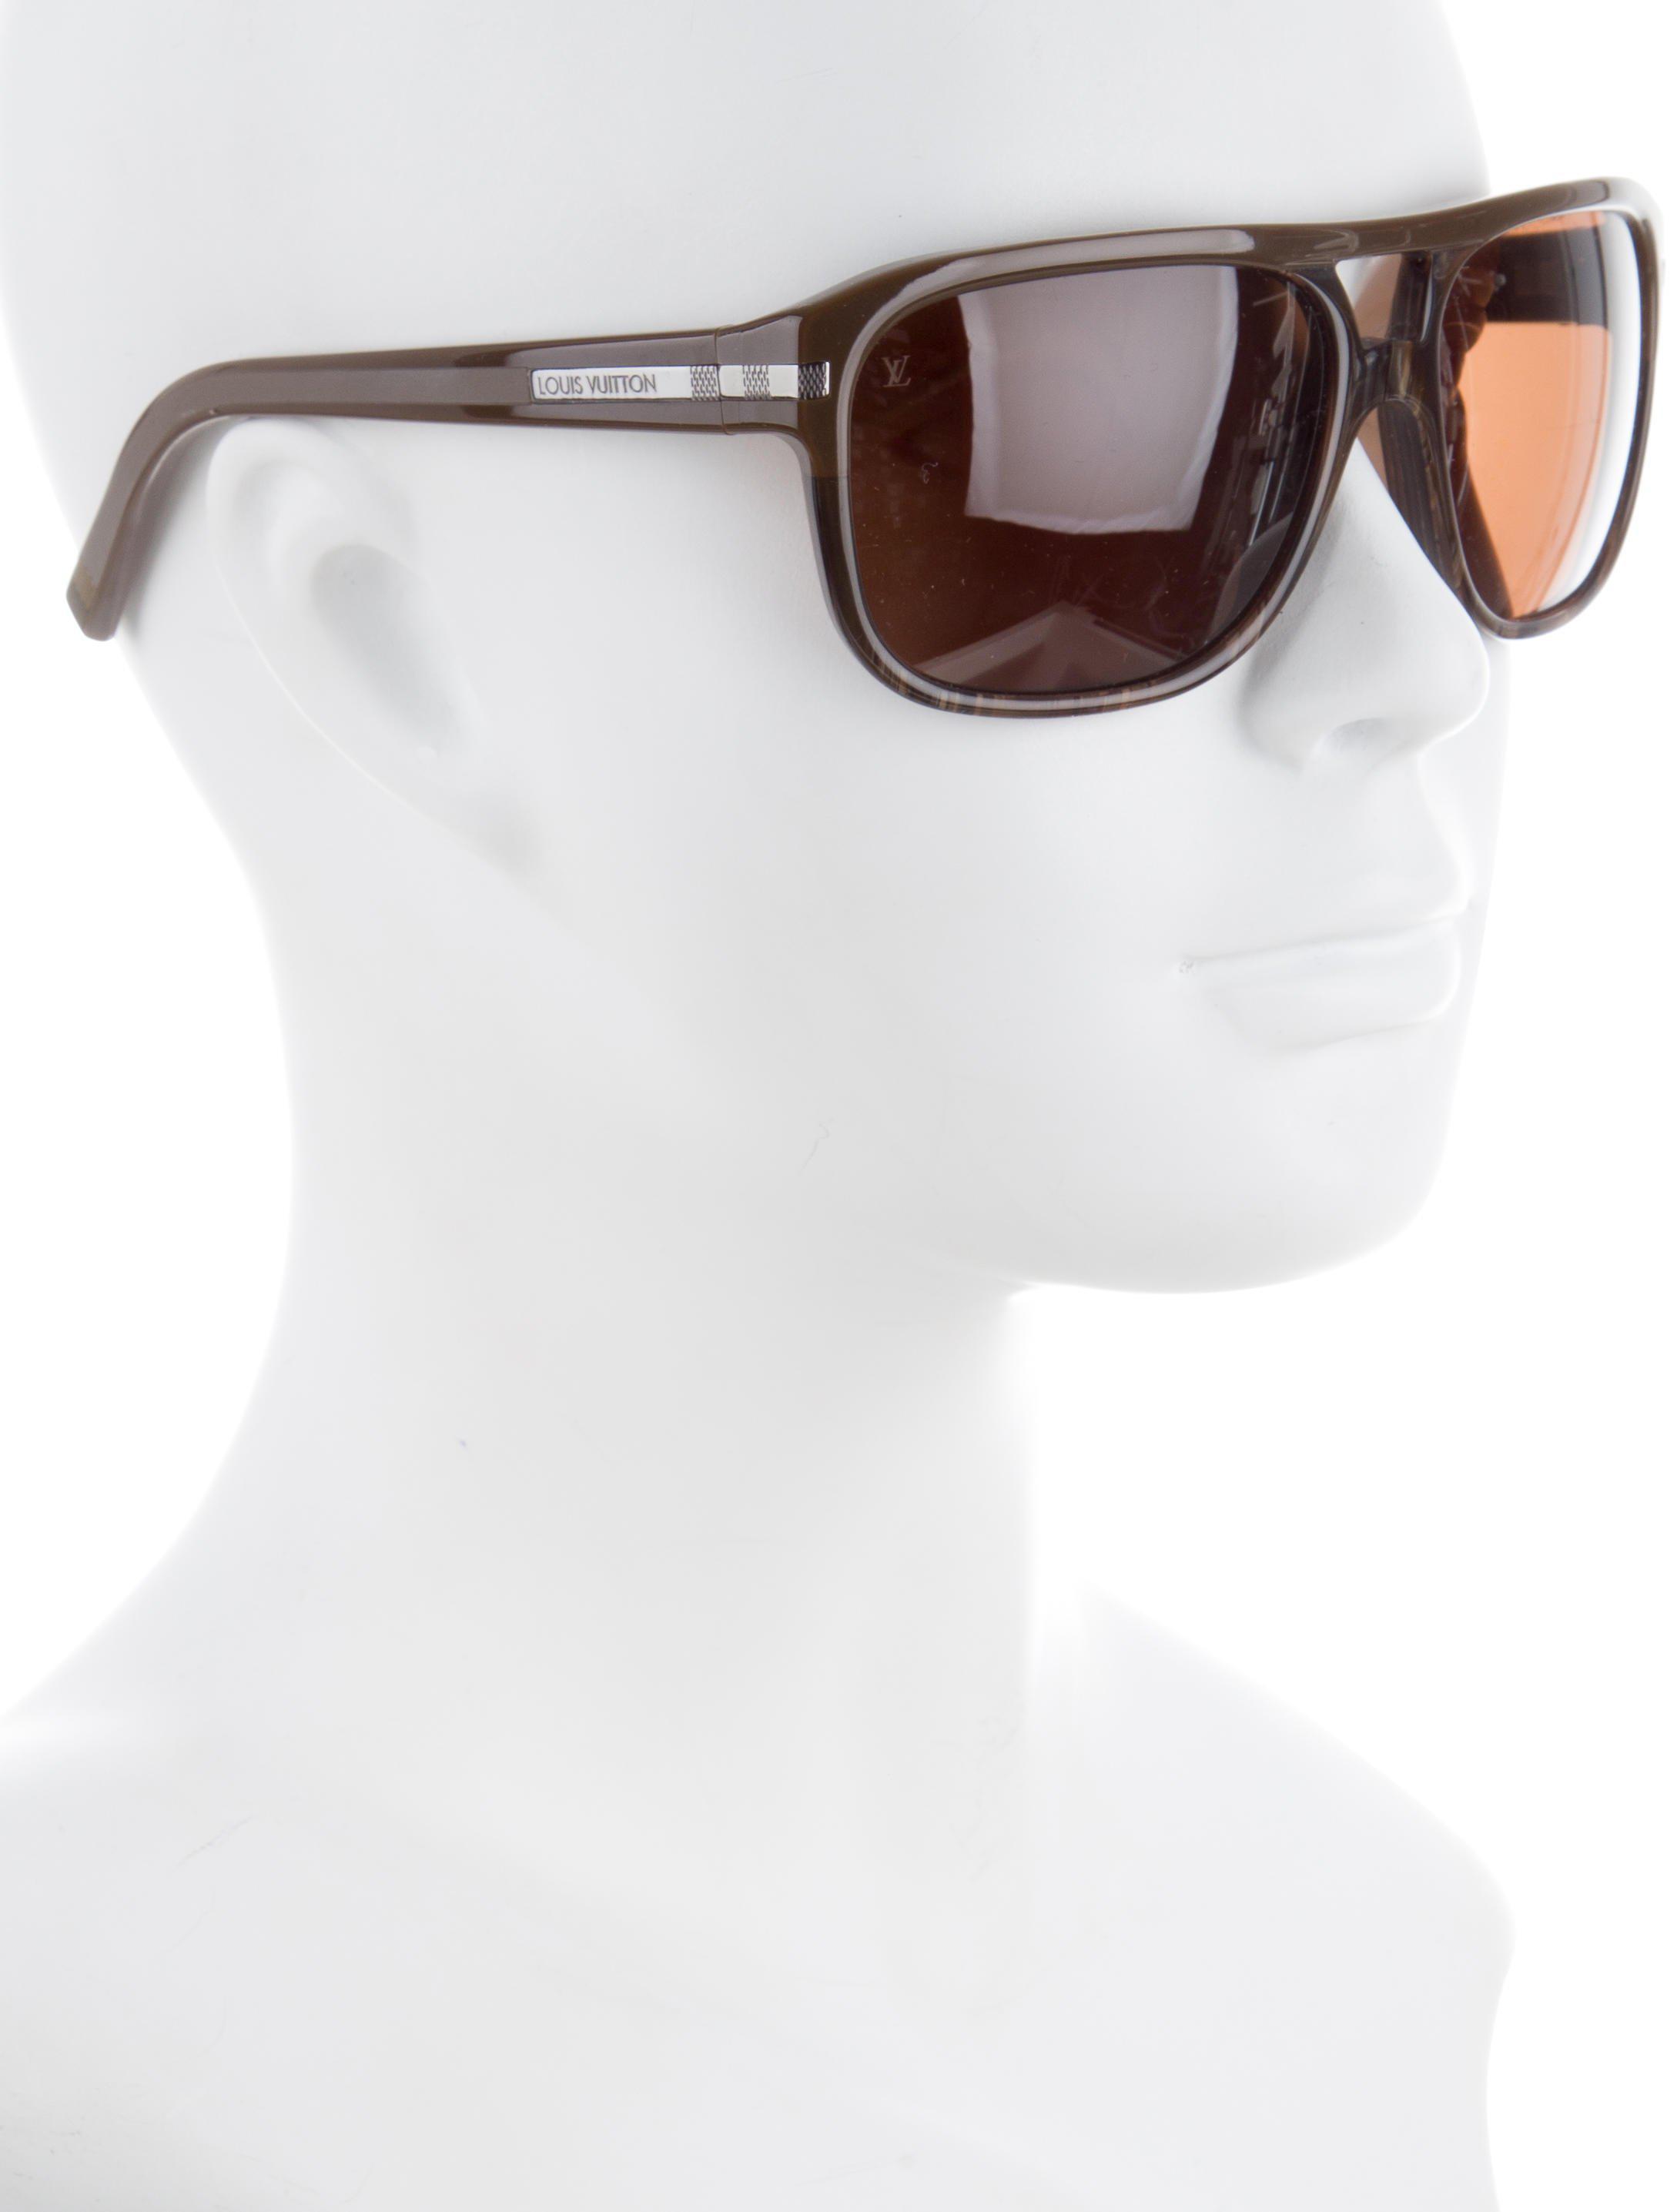 ef6bfb610524 Lyst - Louis Vuitton Possession Pilote Sunglasses Brown in Metallic